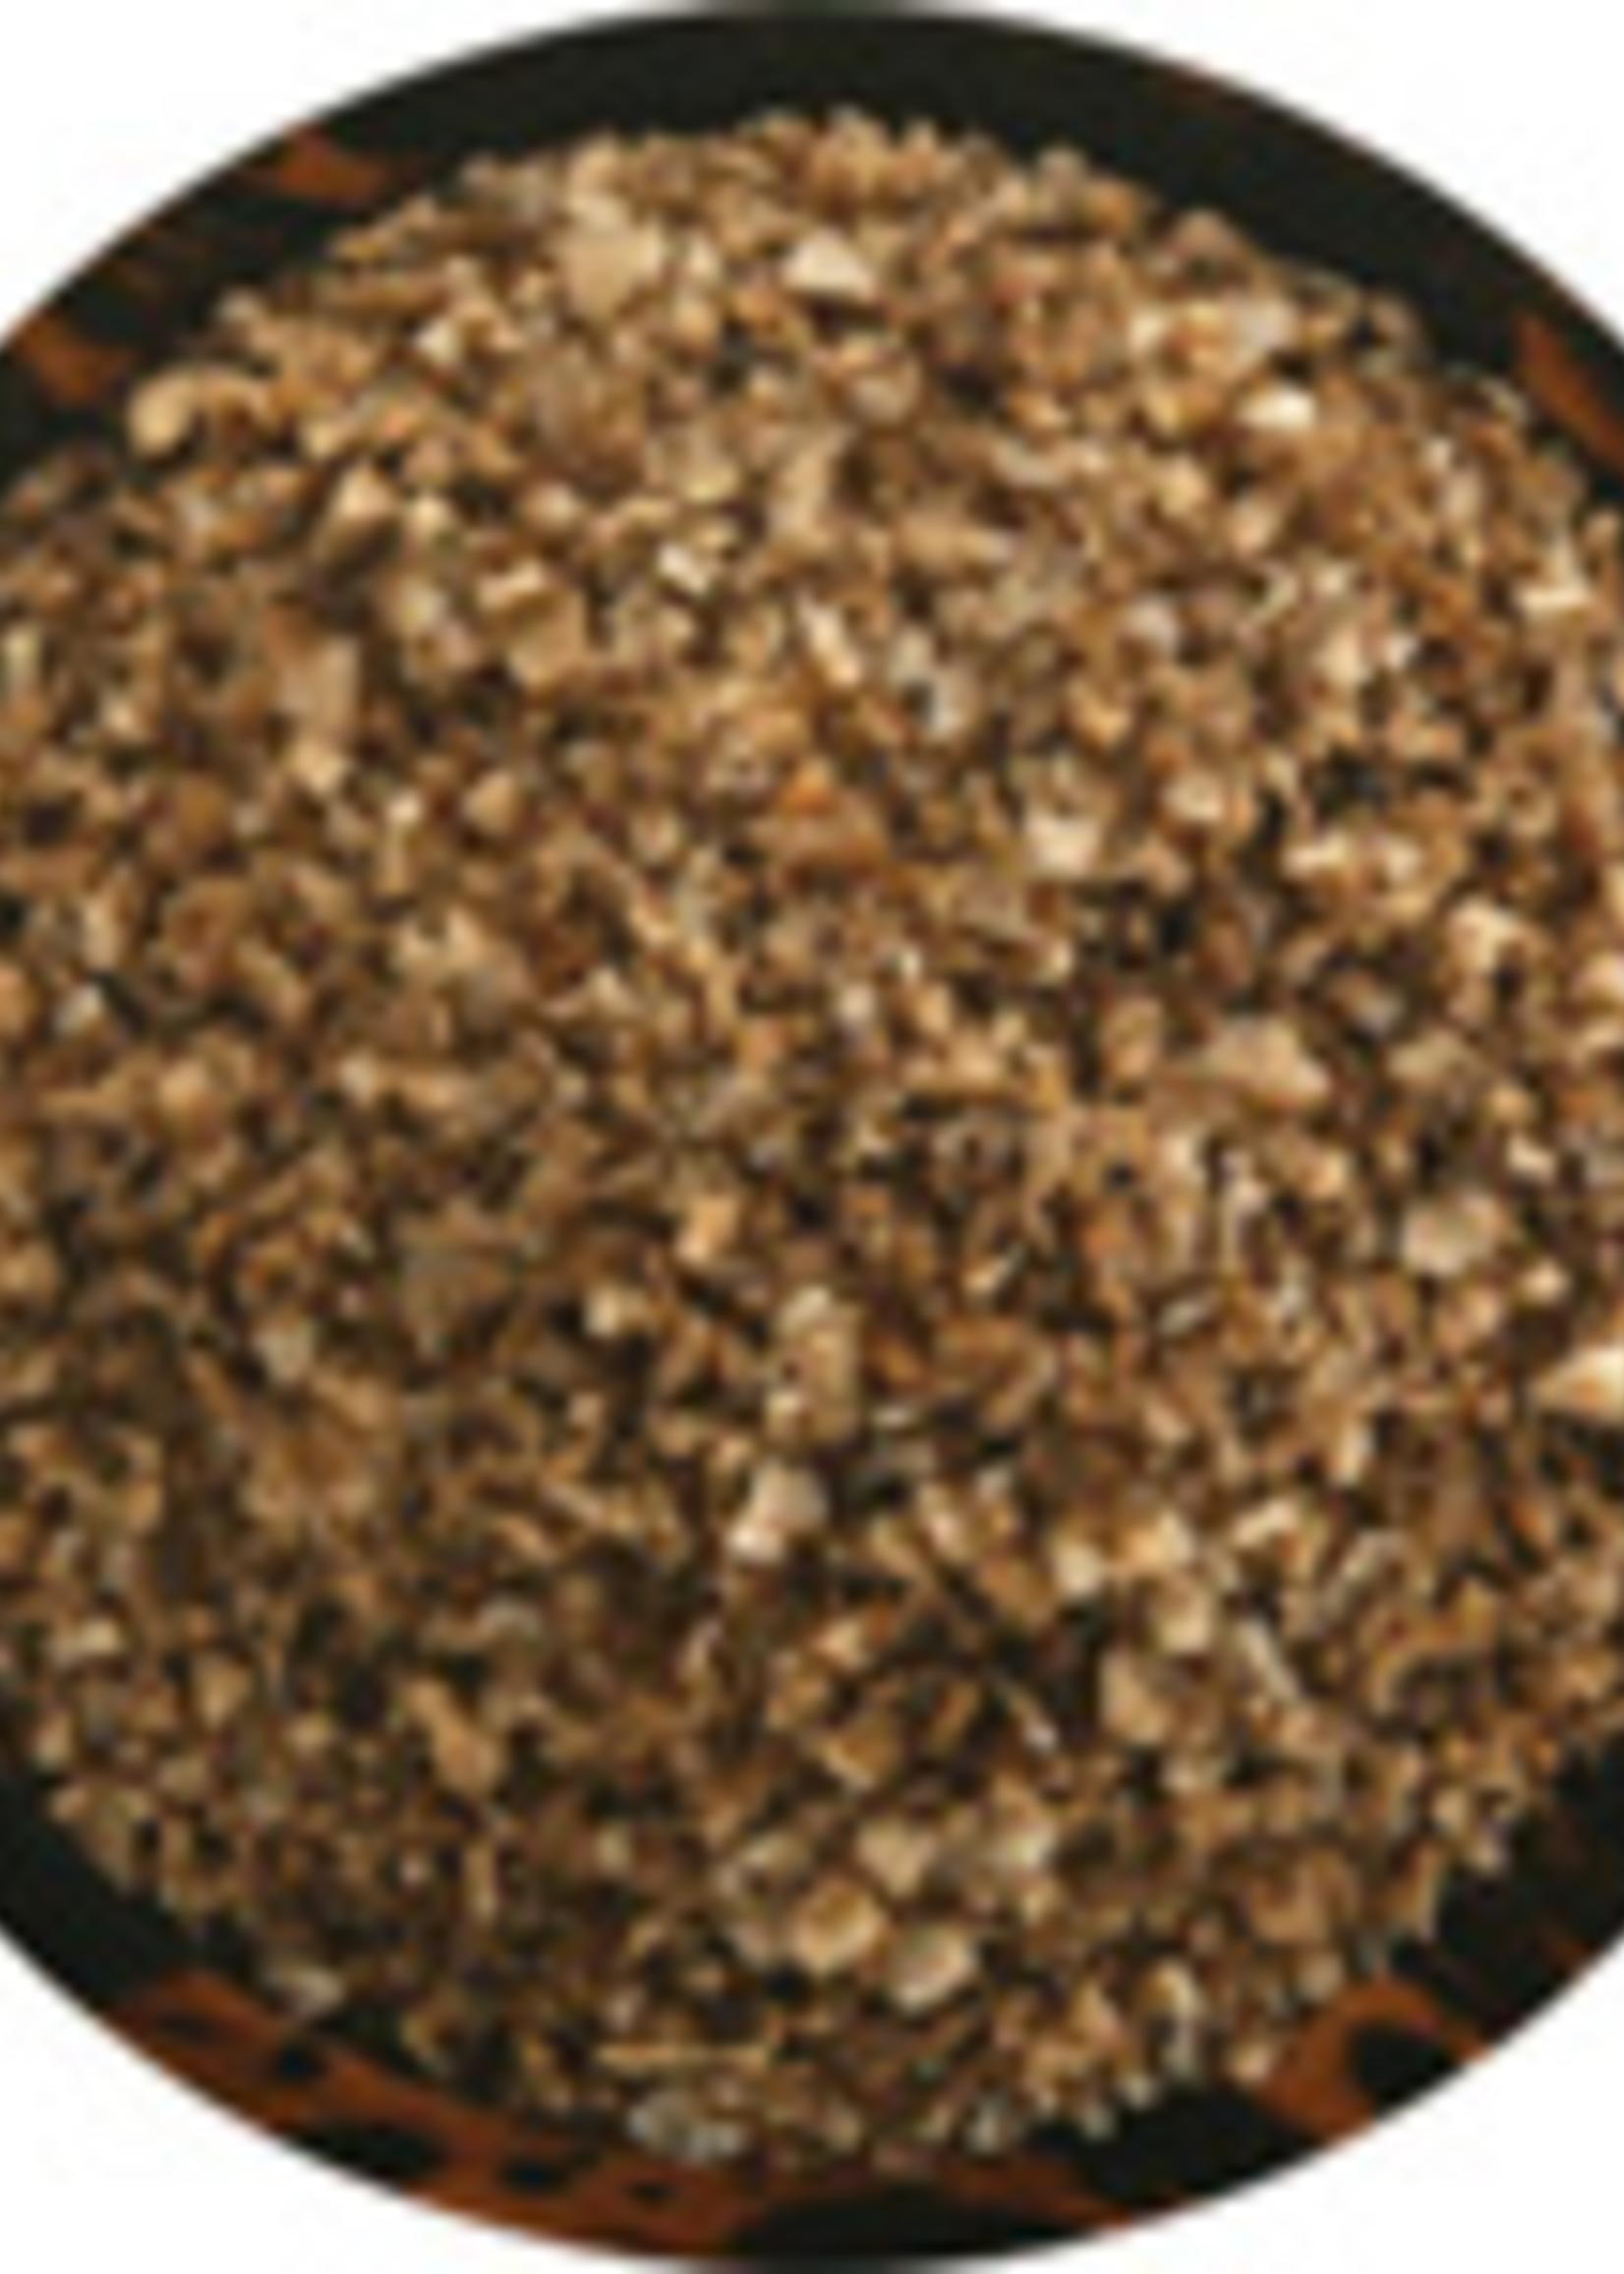 Olive Us Durango Hickory - Smoked Sea Salt